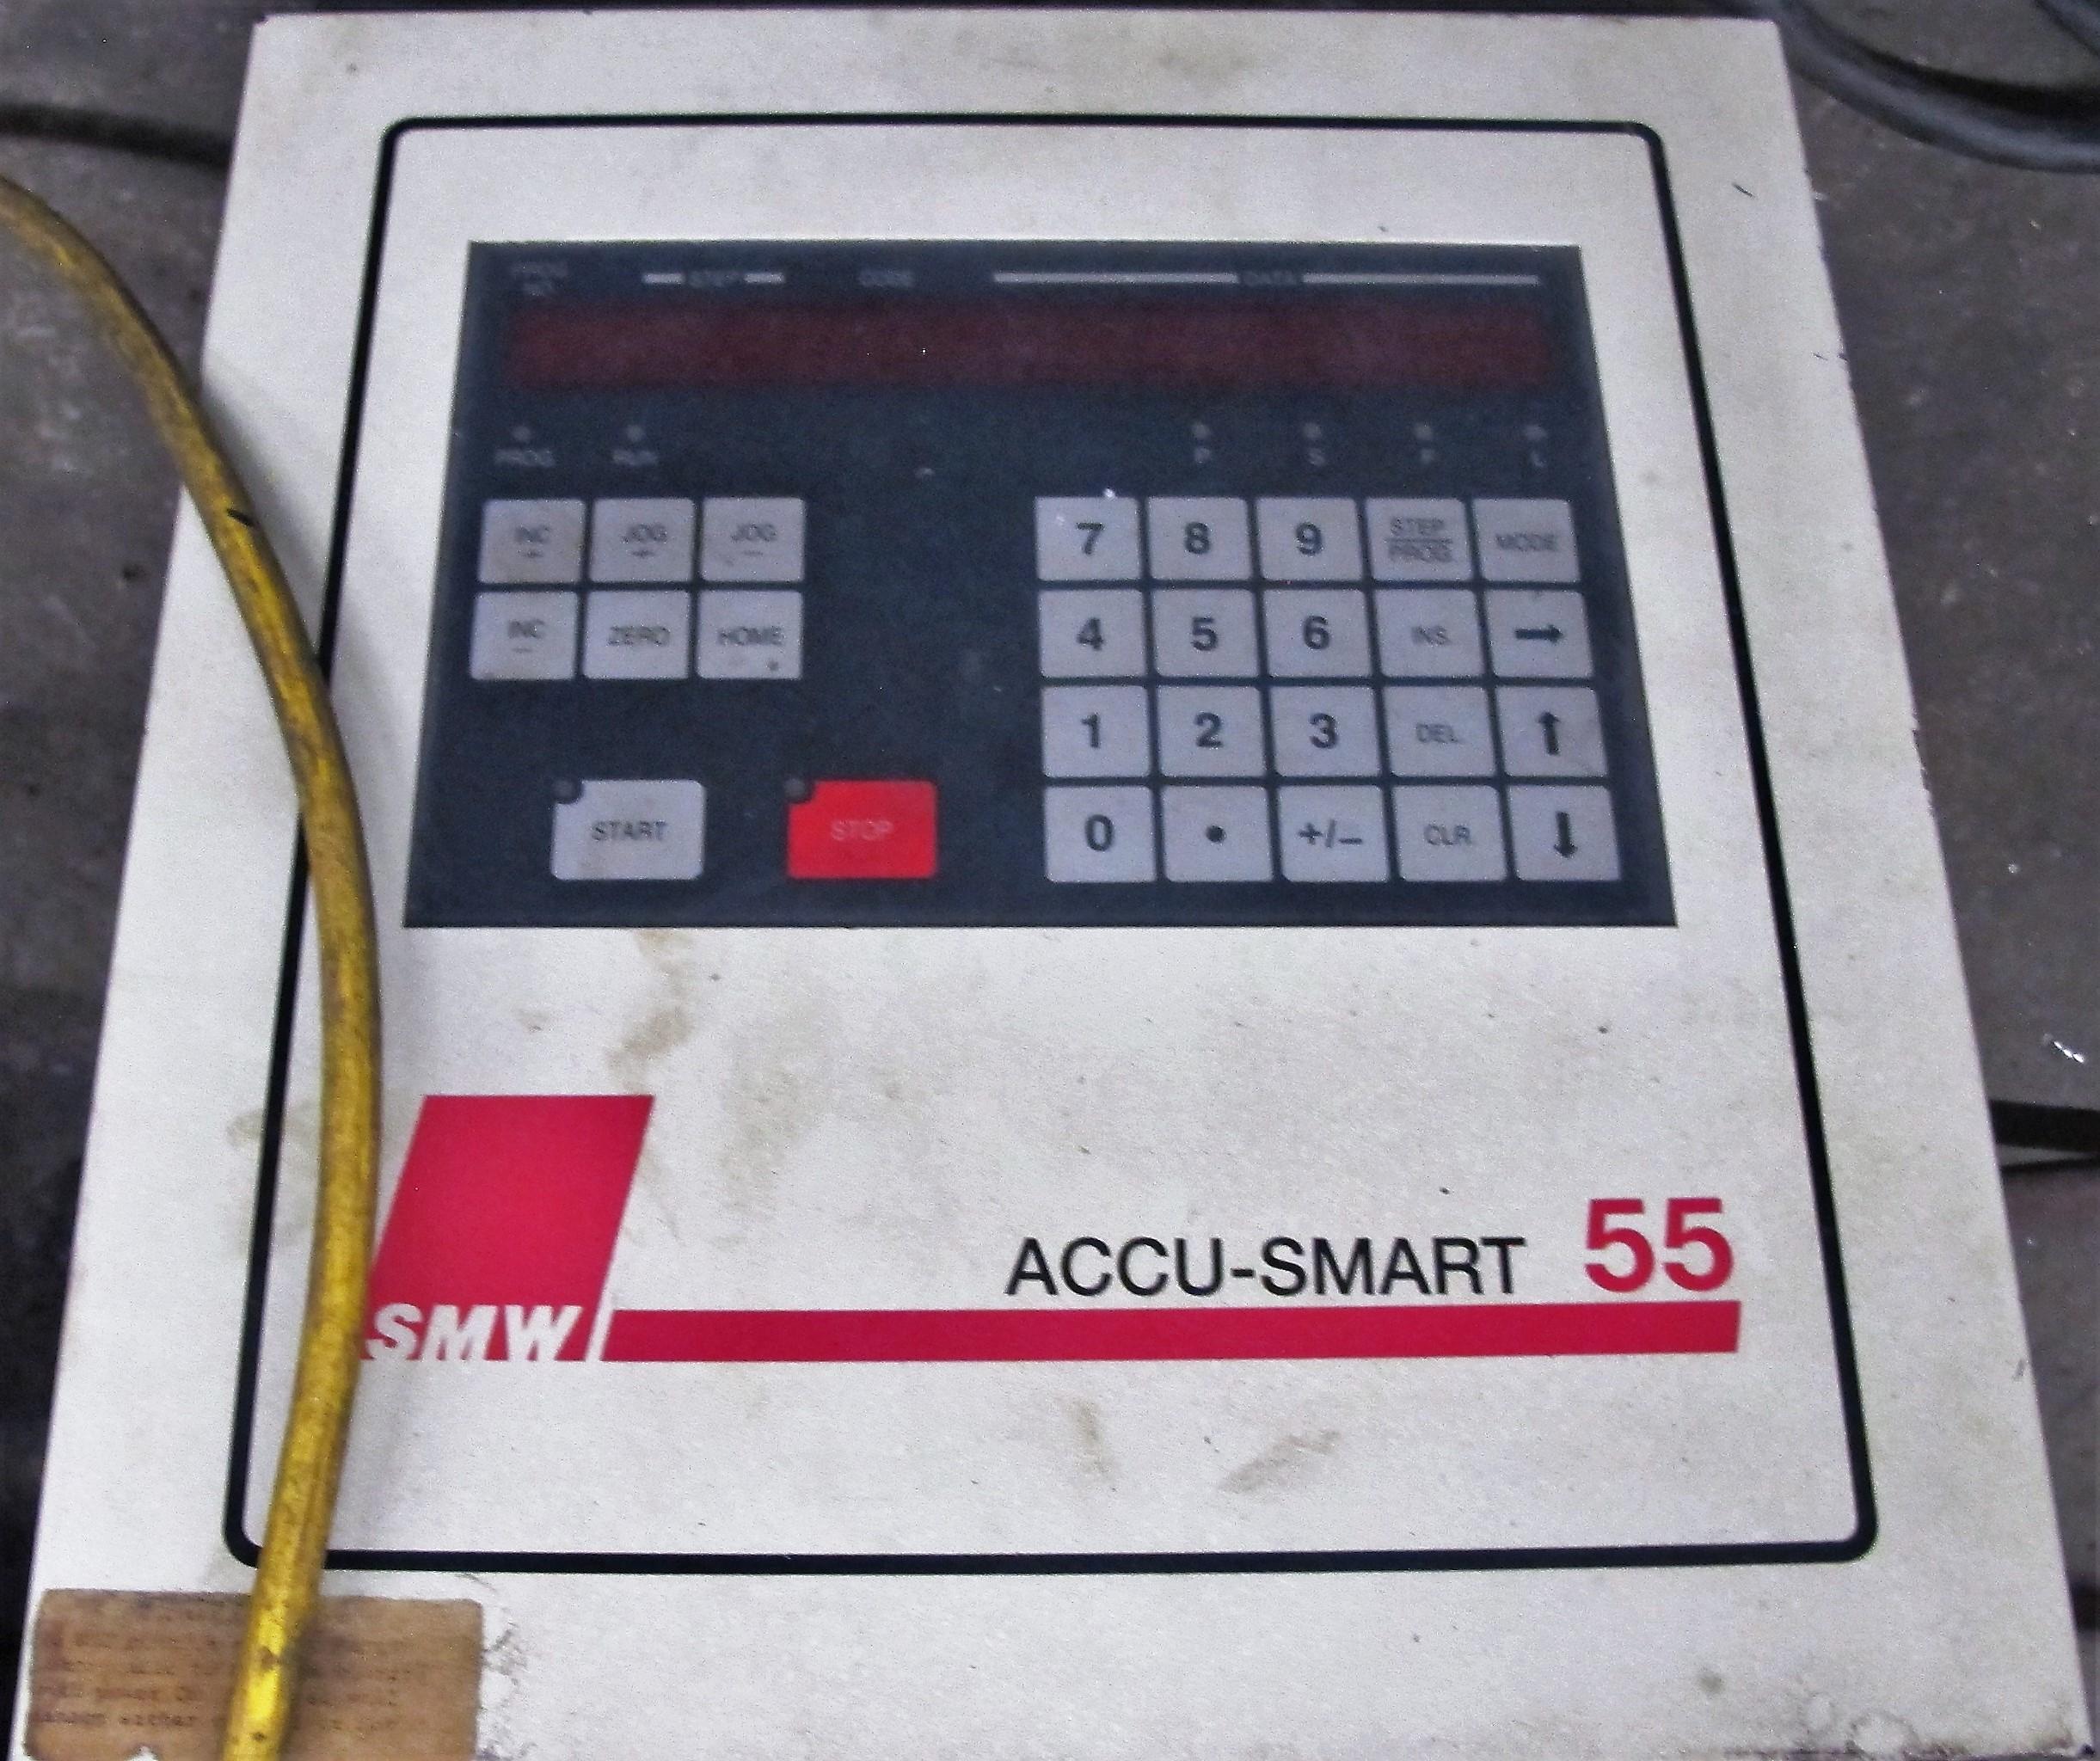 "TREEVMC 800/20 CNC VERTICAL MACHINING CENTER, S/N TS80900014U, PC-2100 CNC CONTROL, ATC, 25"" x - Image 14 of 16"